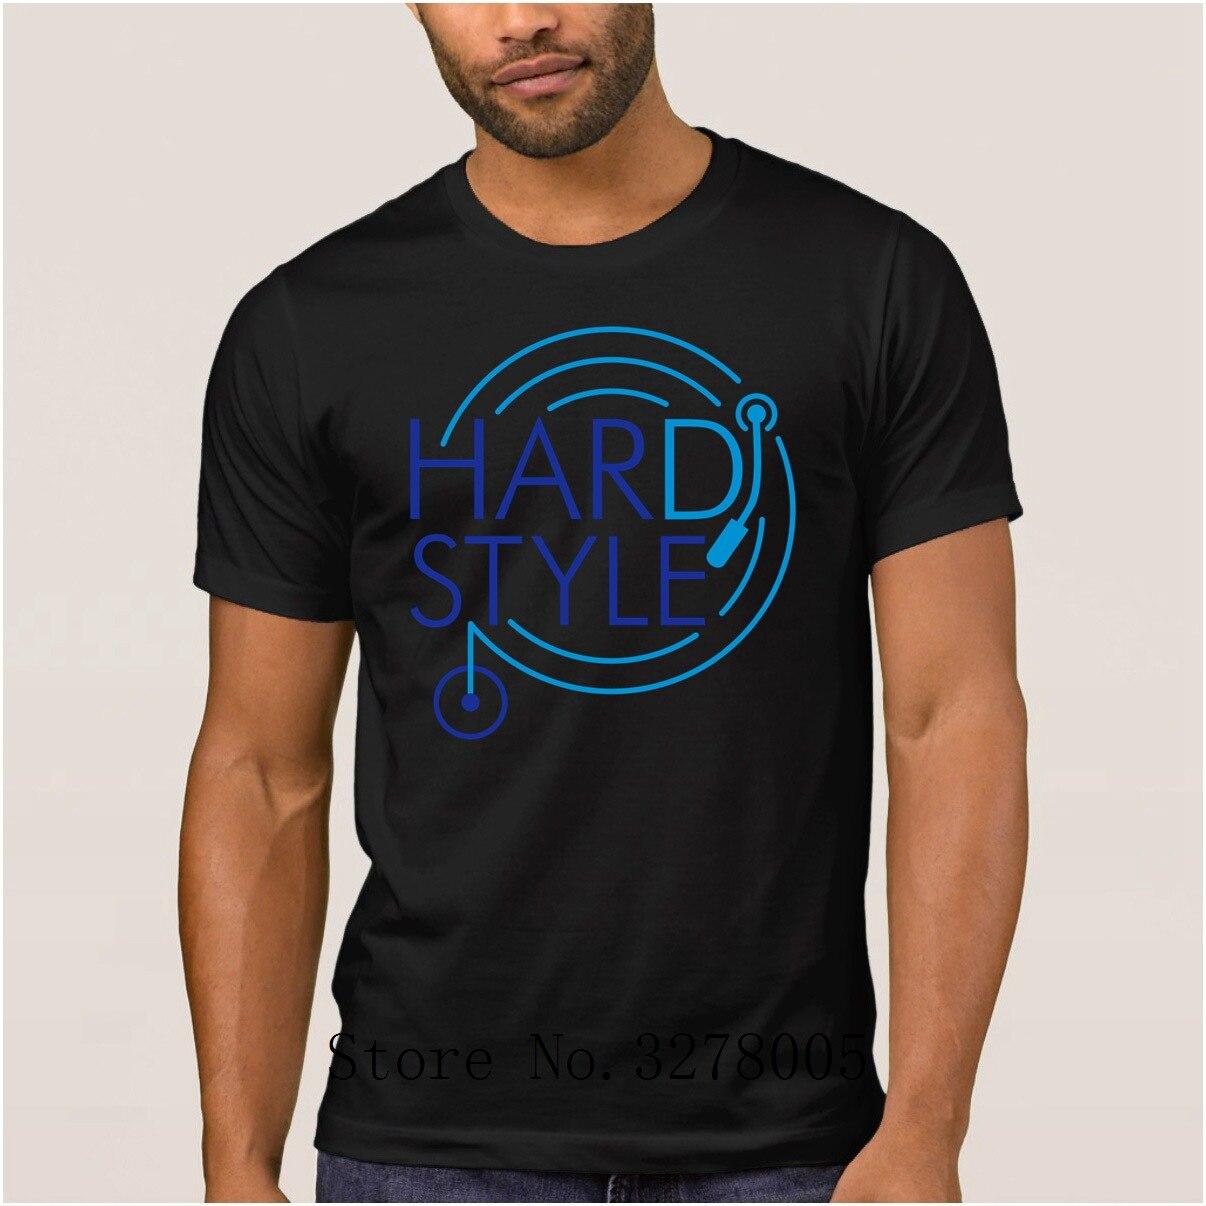 Трикотажные буквы новая мужская футболка Hardstyle Dj Уникальная футболка мужская летняя стильная 100% хлопковая одежда мужская футболка наивысш...